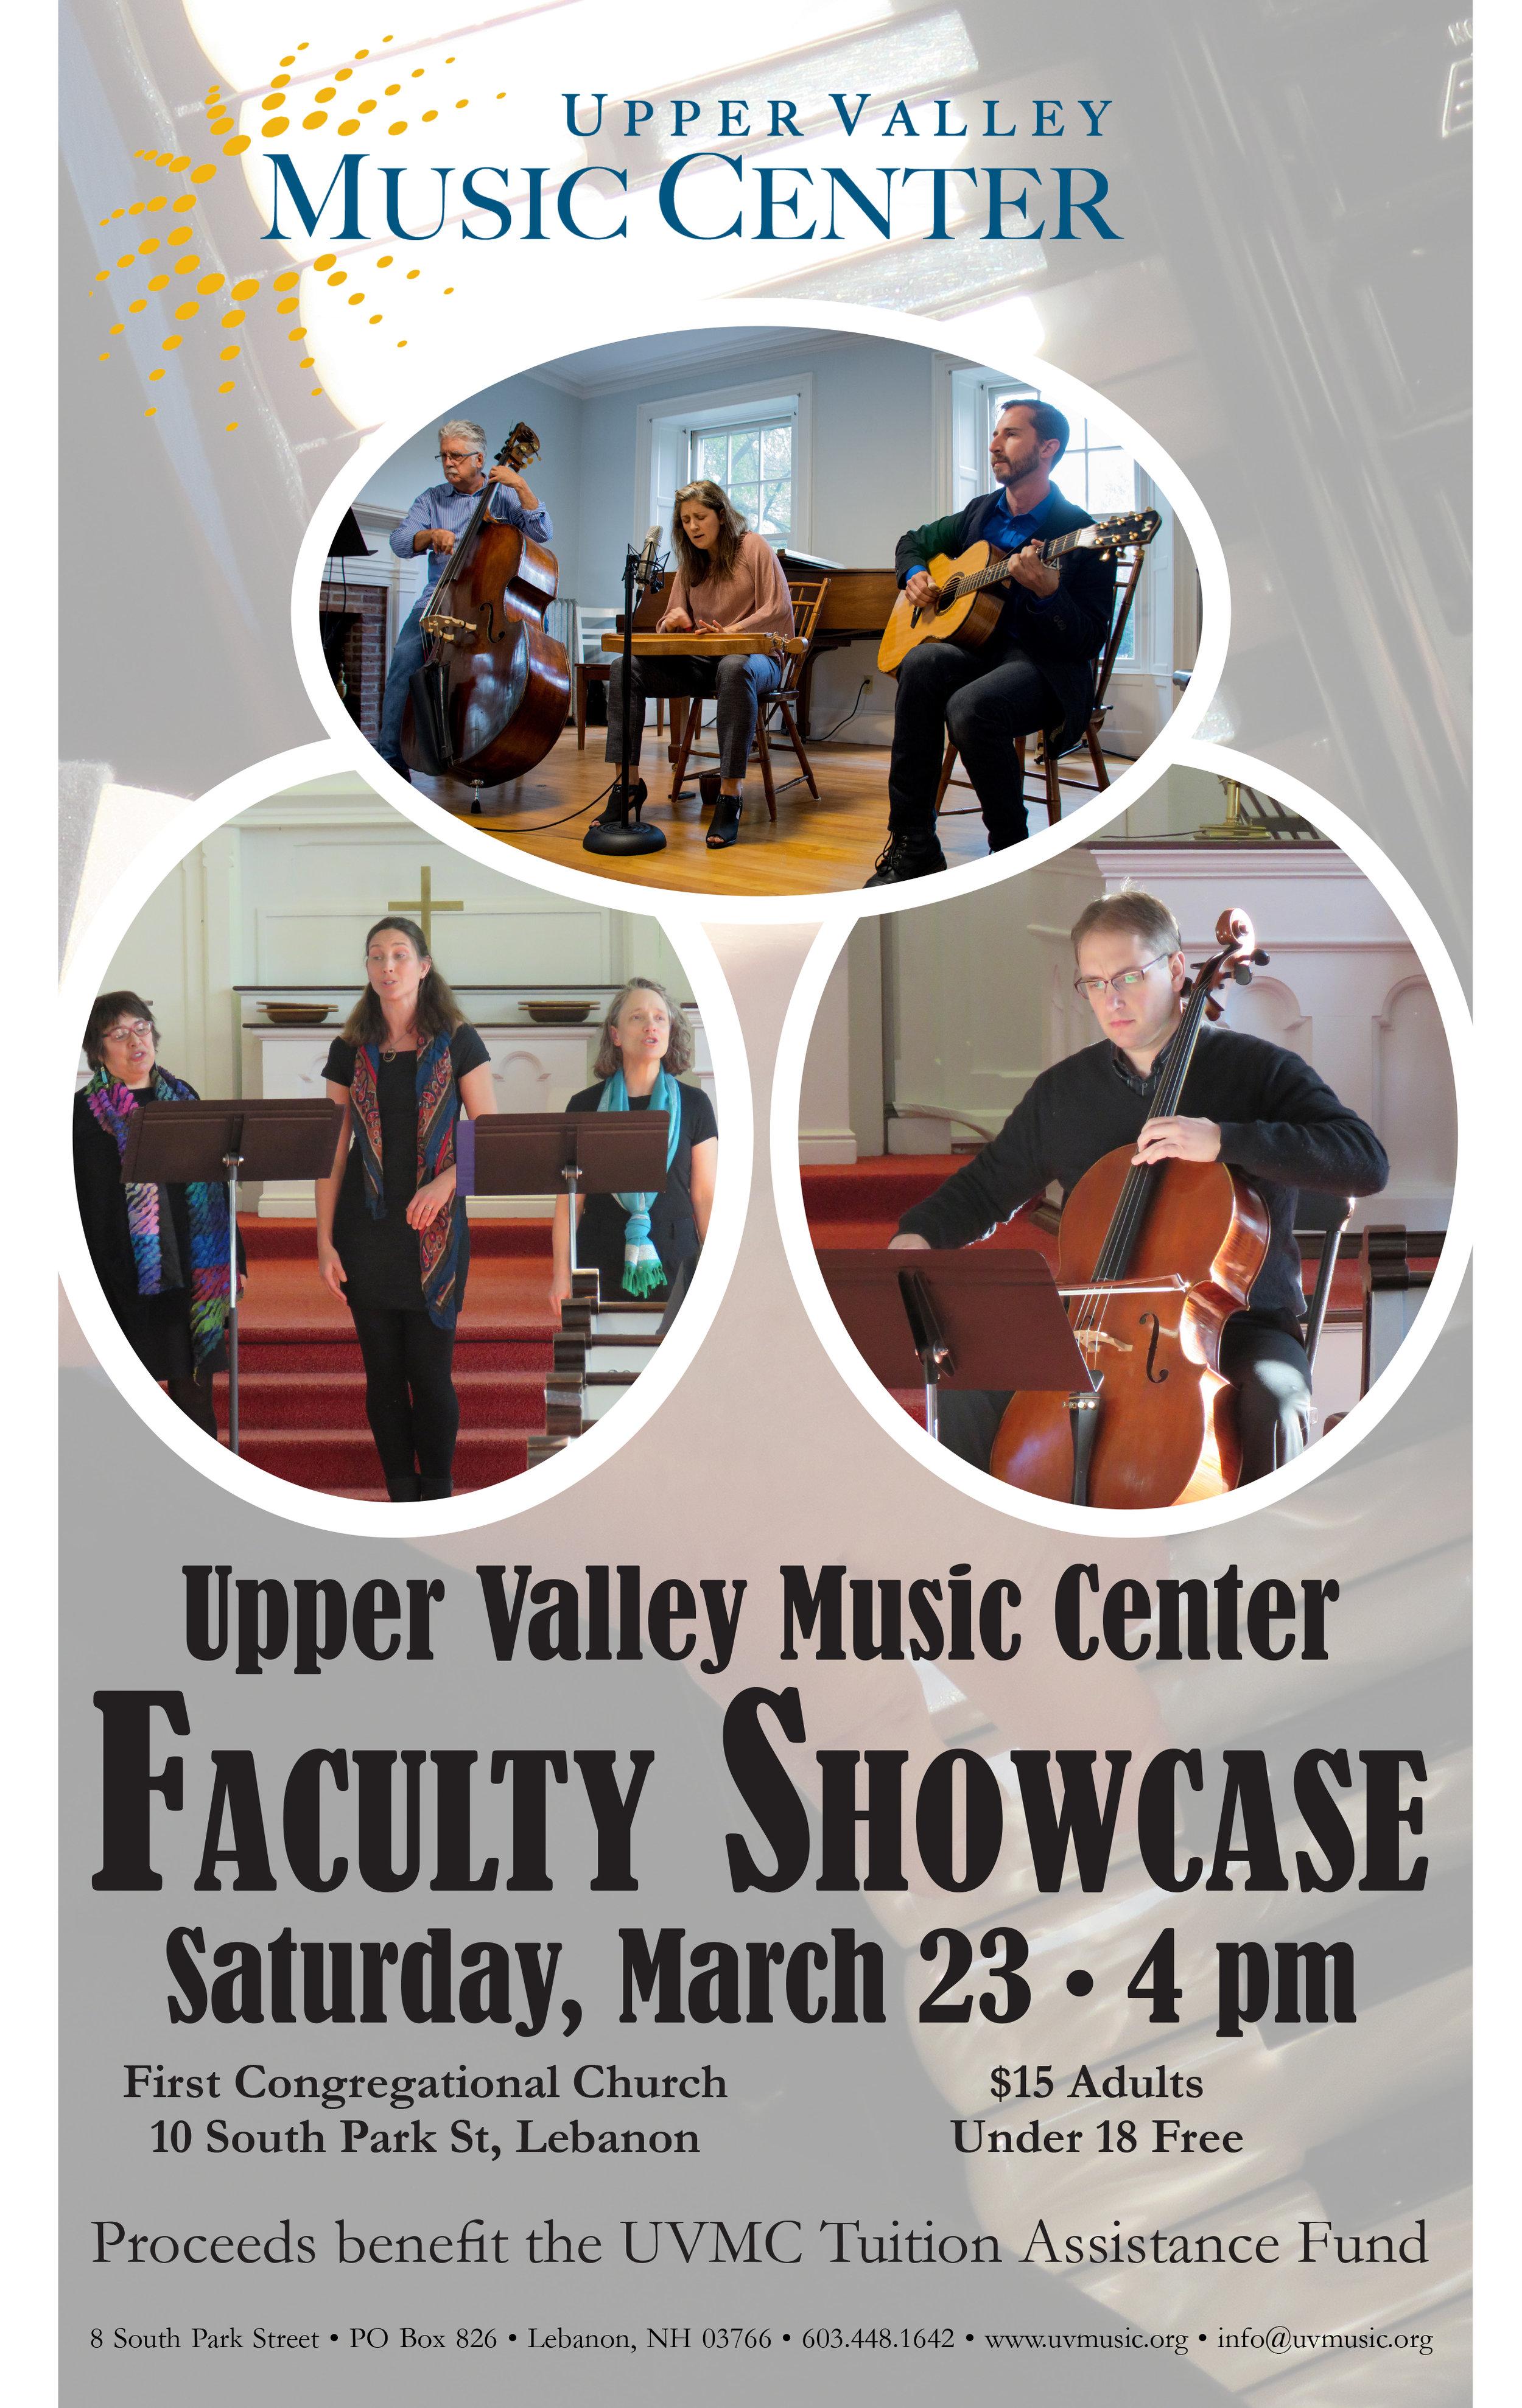 UVMC_Faculty_Showcase_2019.jpg